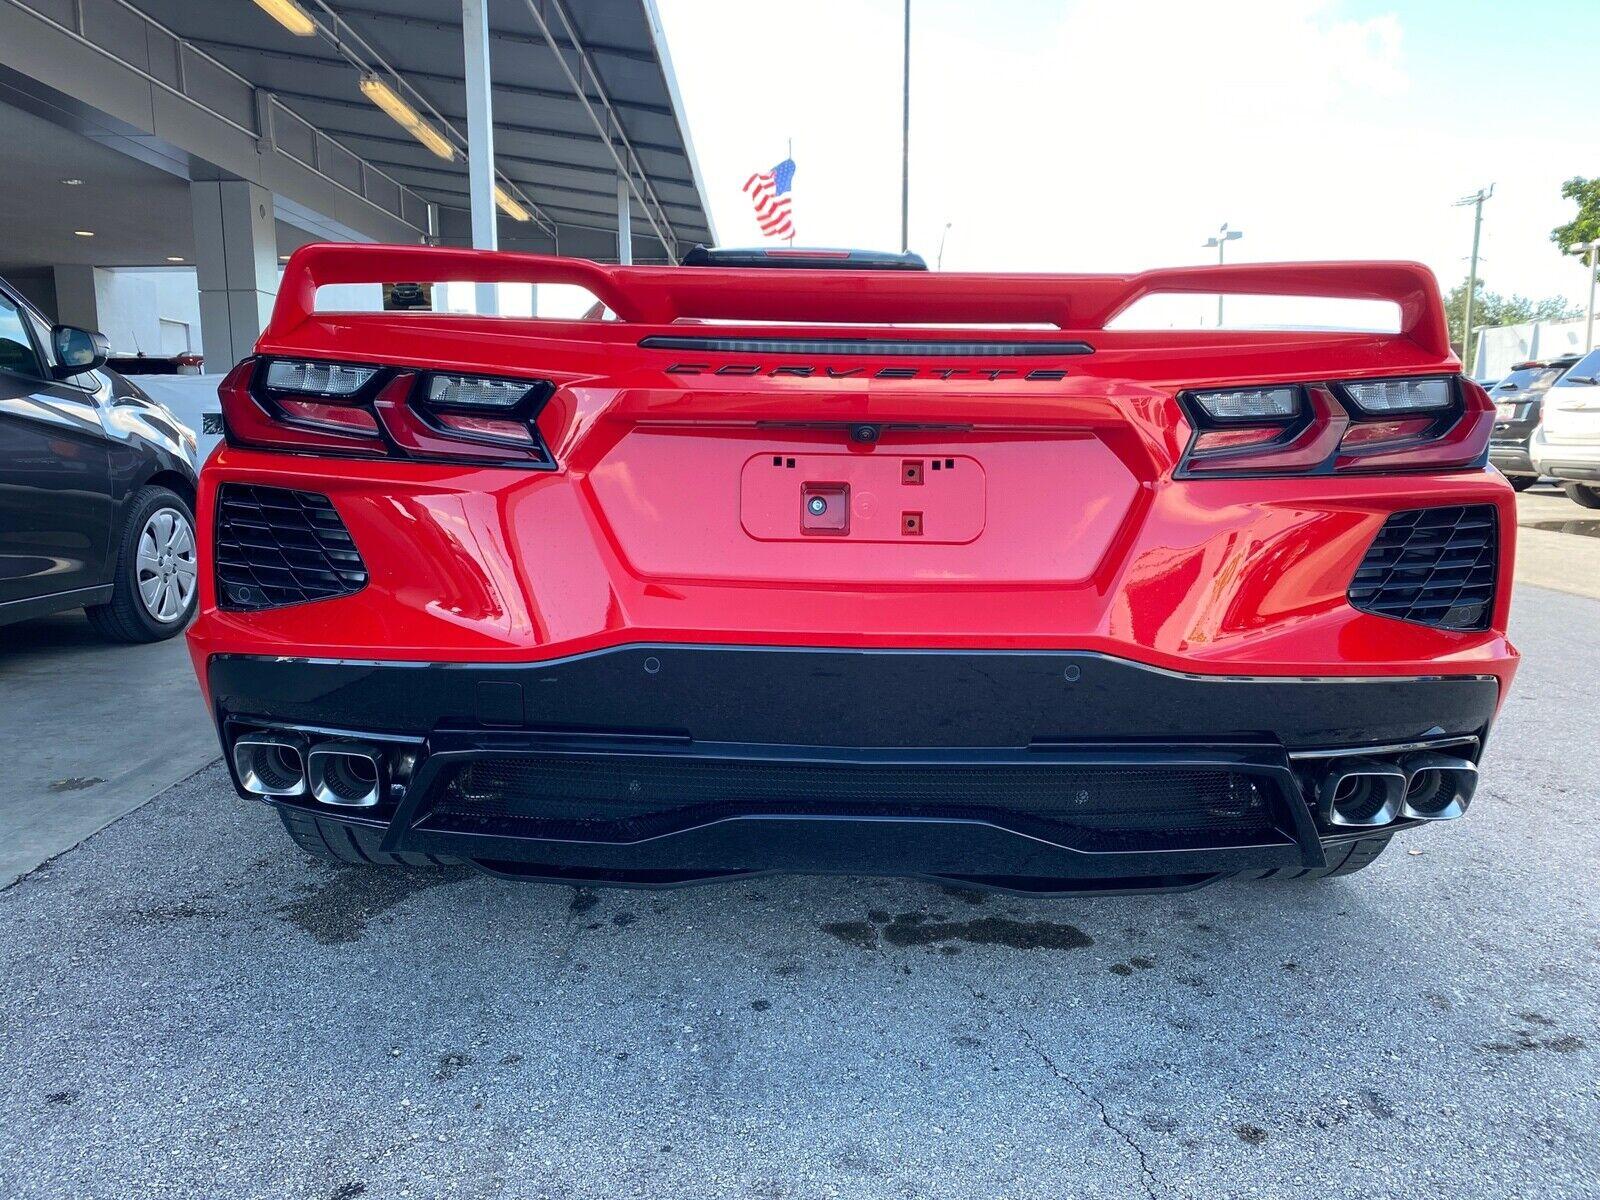 2020 Red Chevrolet Corvette   | C7 Corvette Photo 2